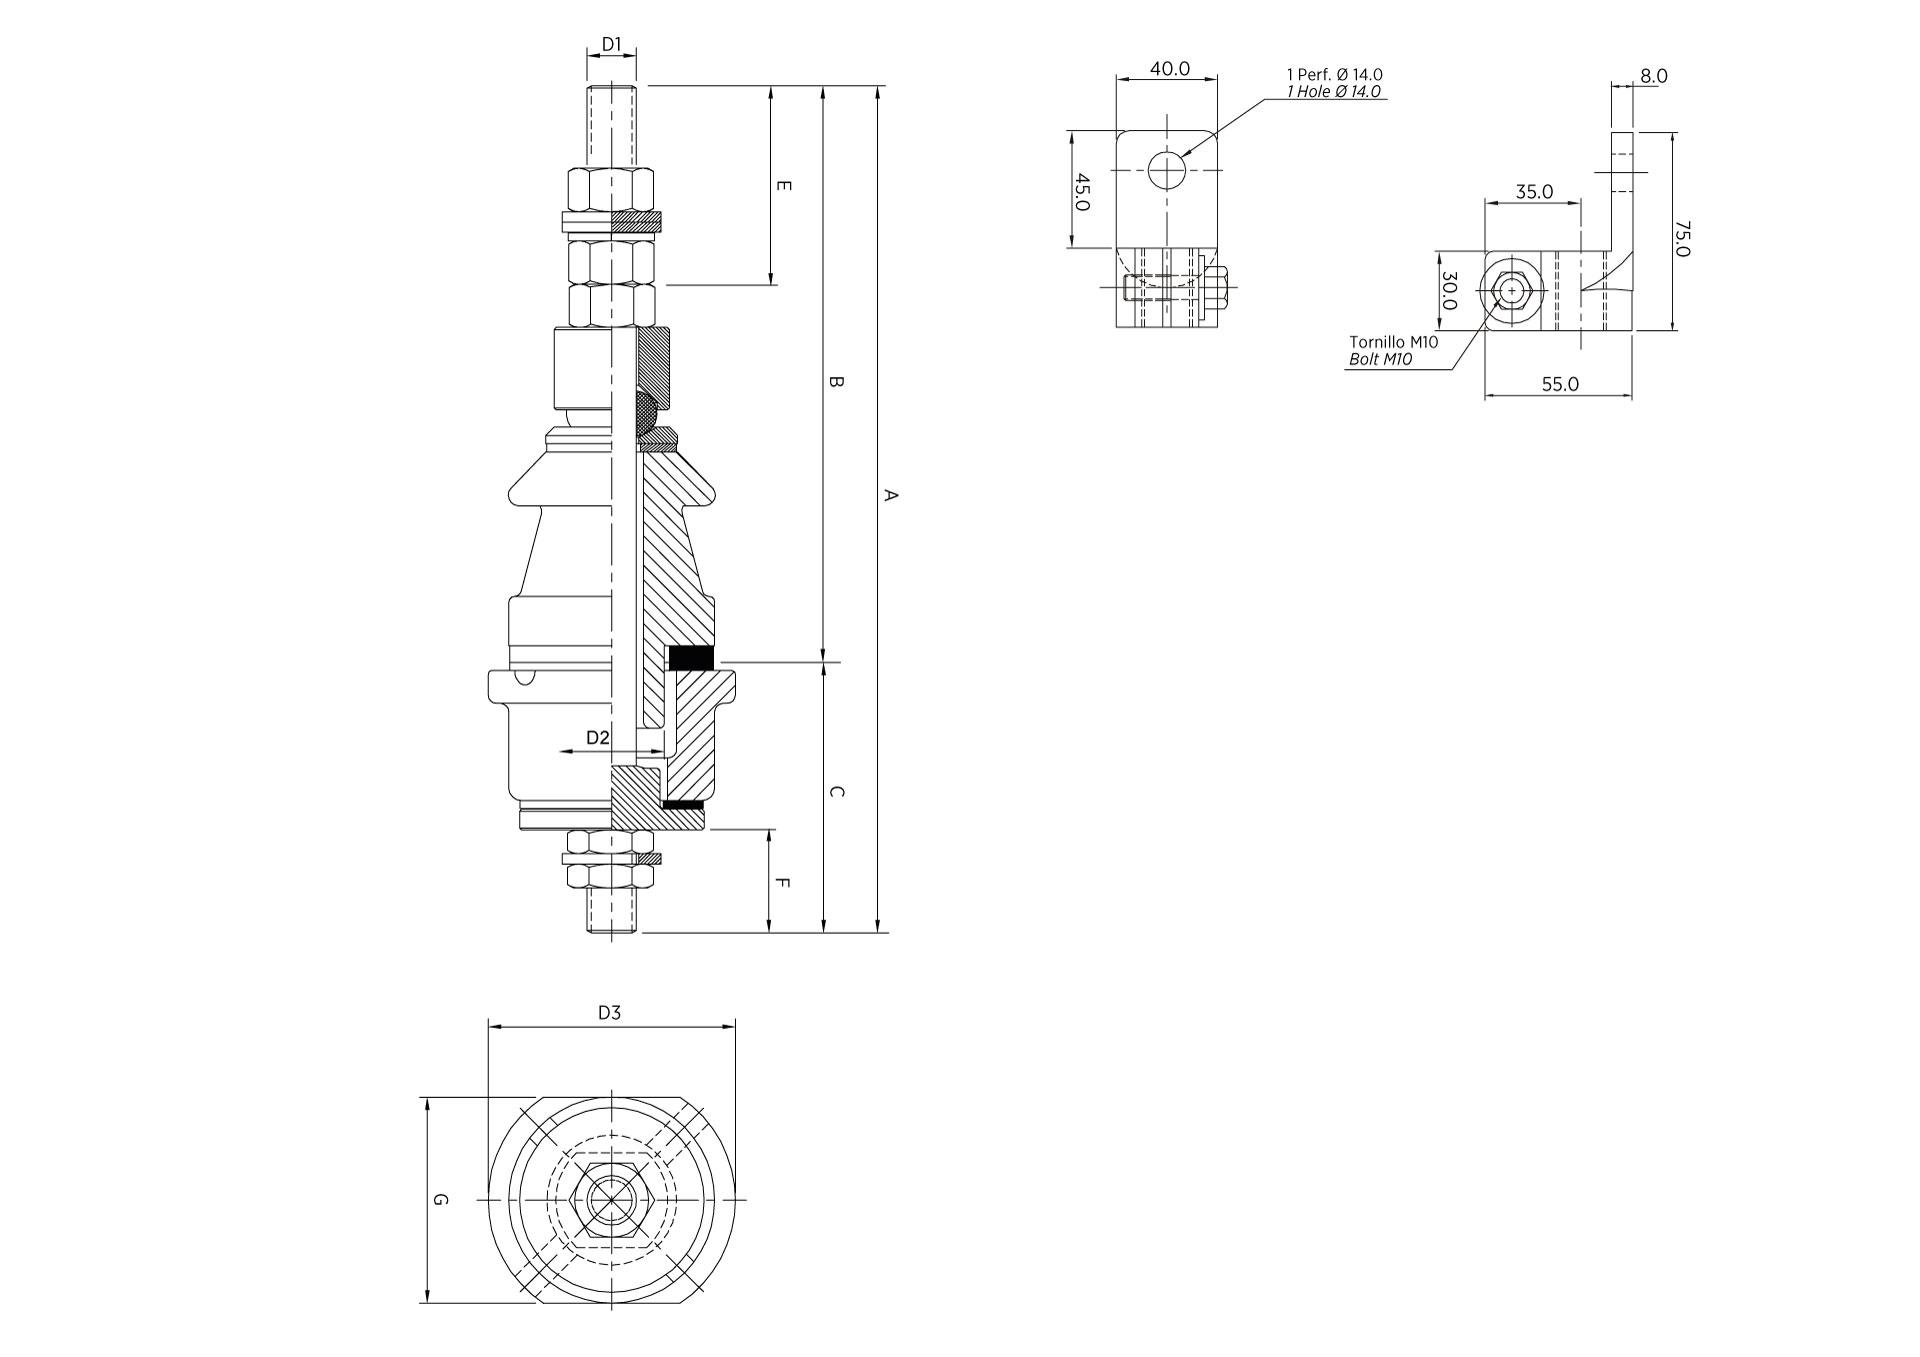 LV BUSHING 42530 DT 1/250 1.0KV 250A